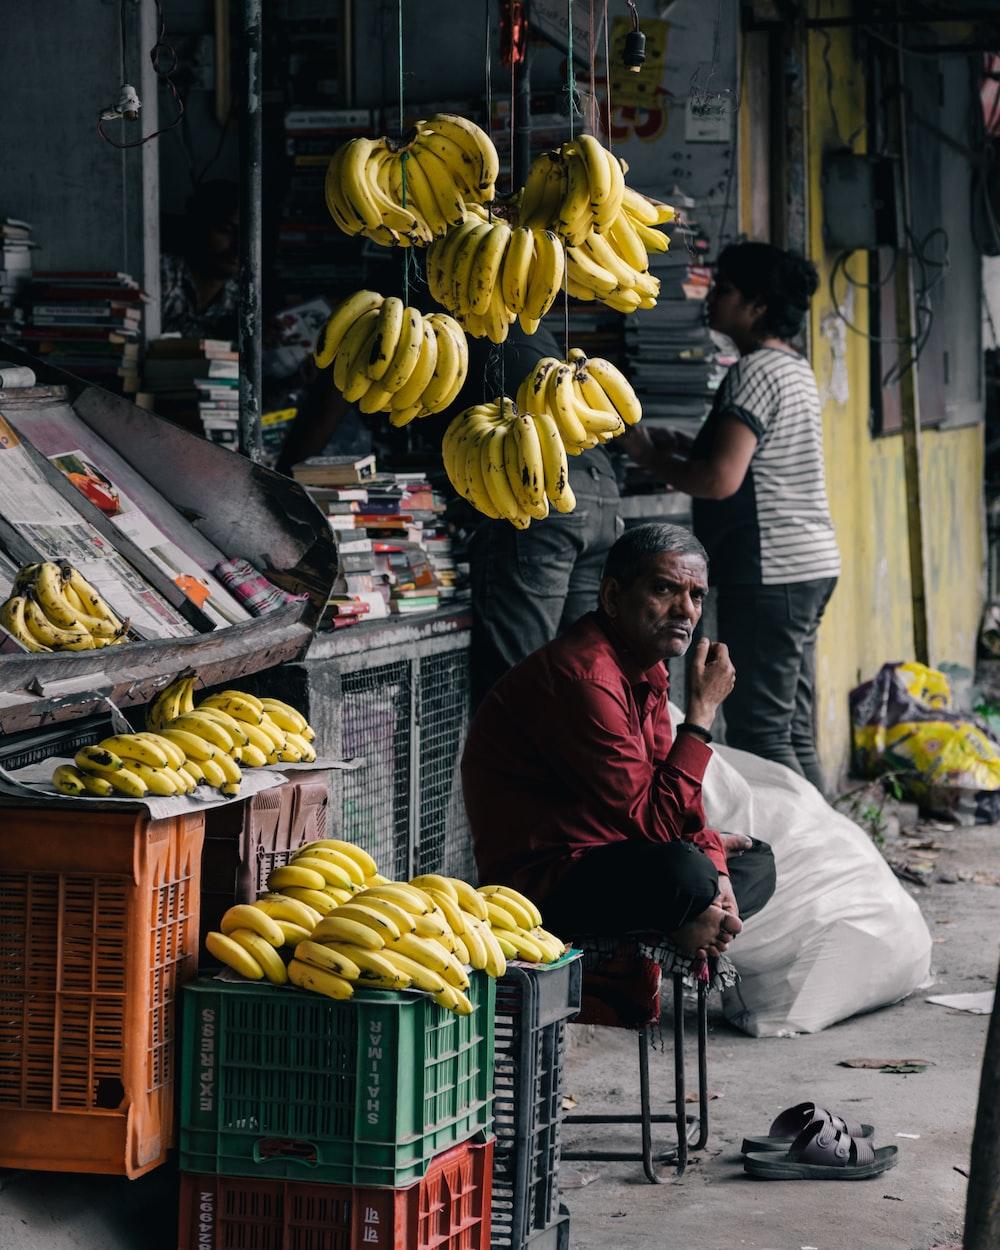 man sitting on chair near bananas